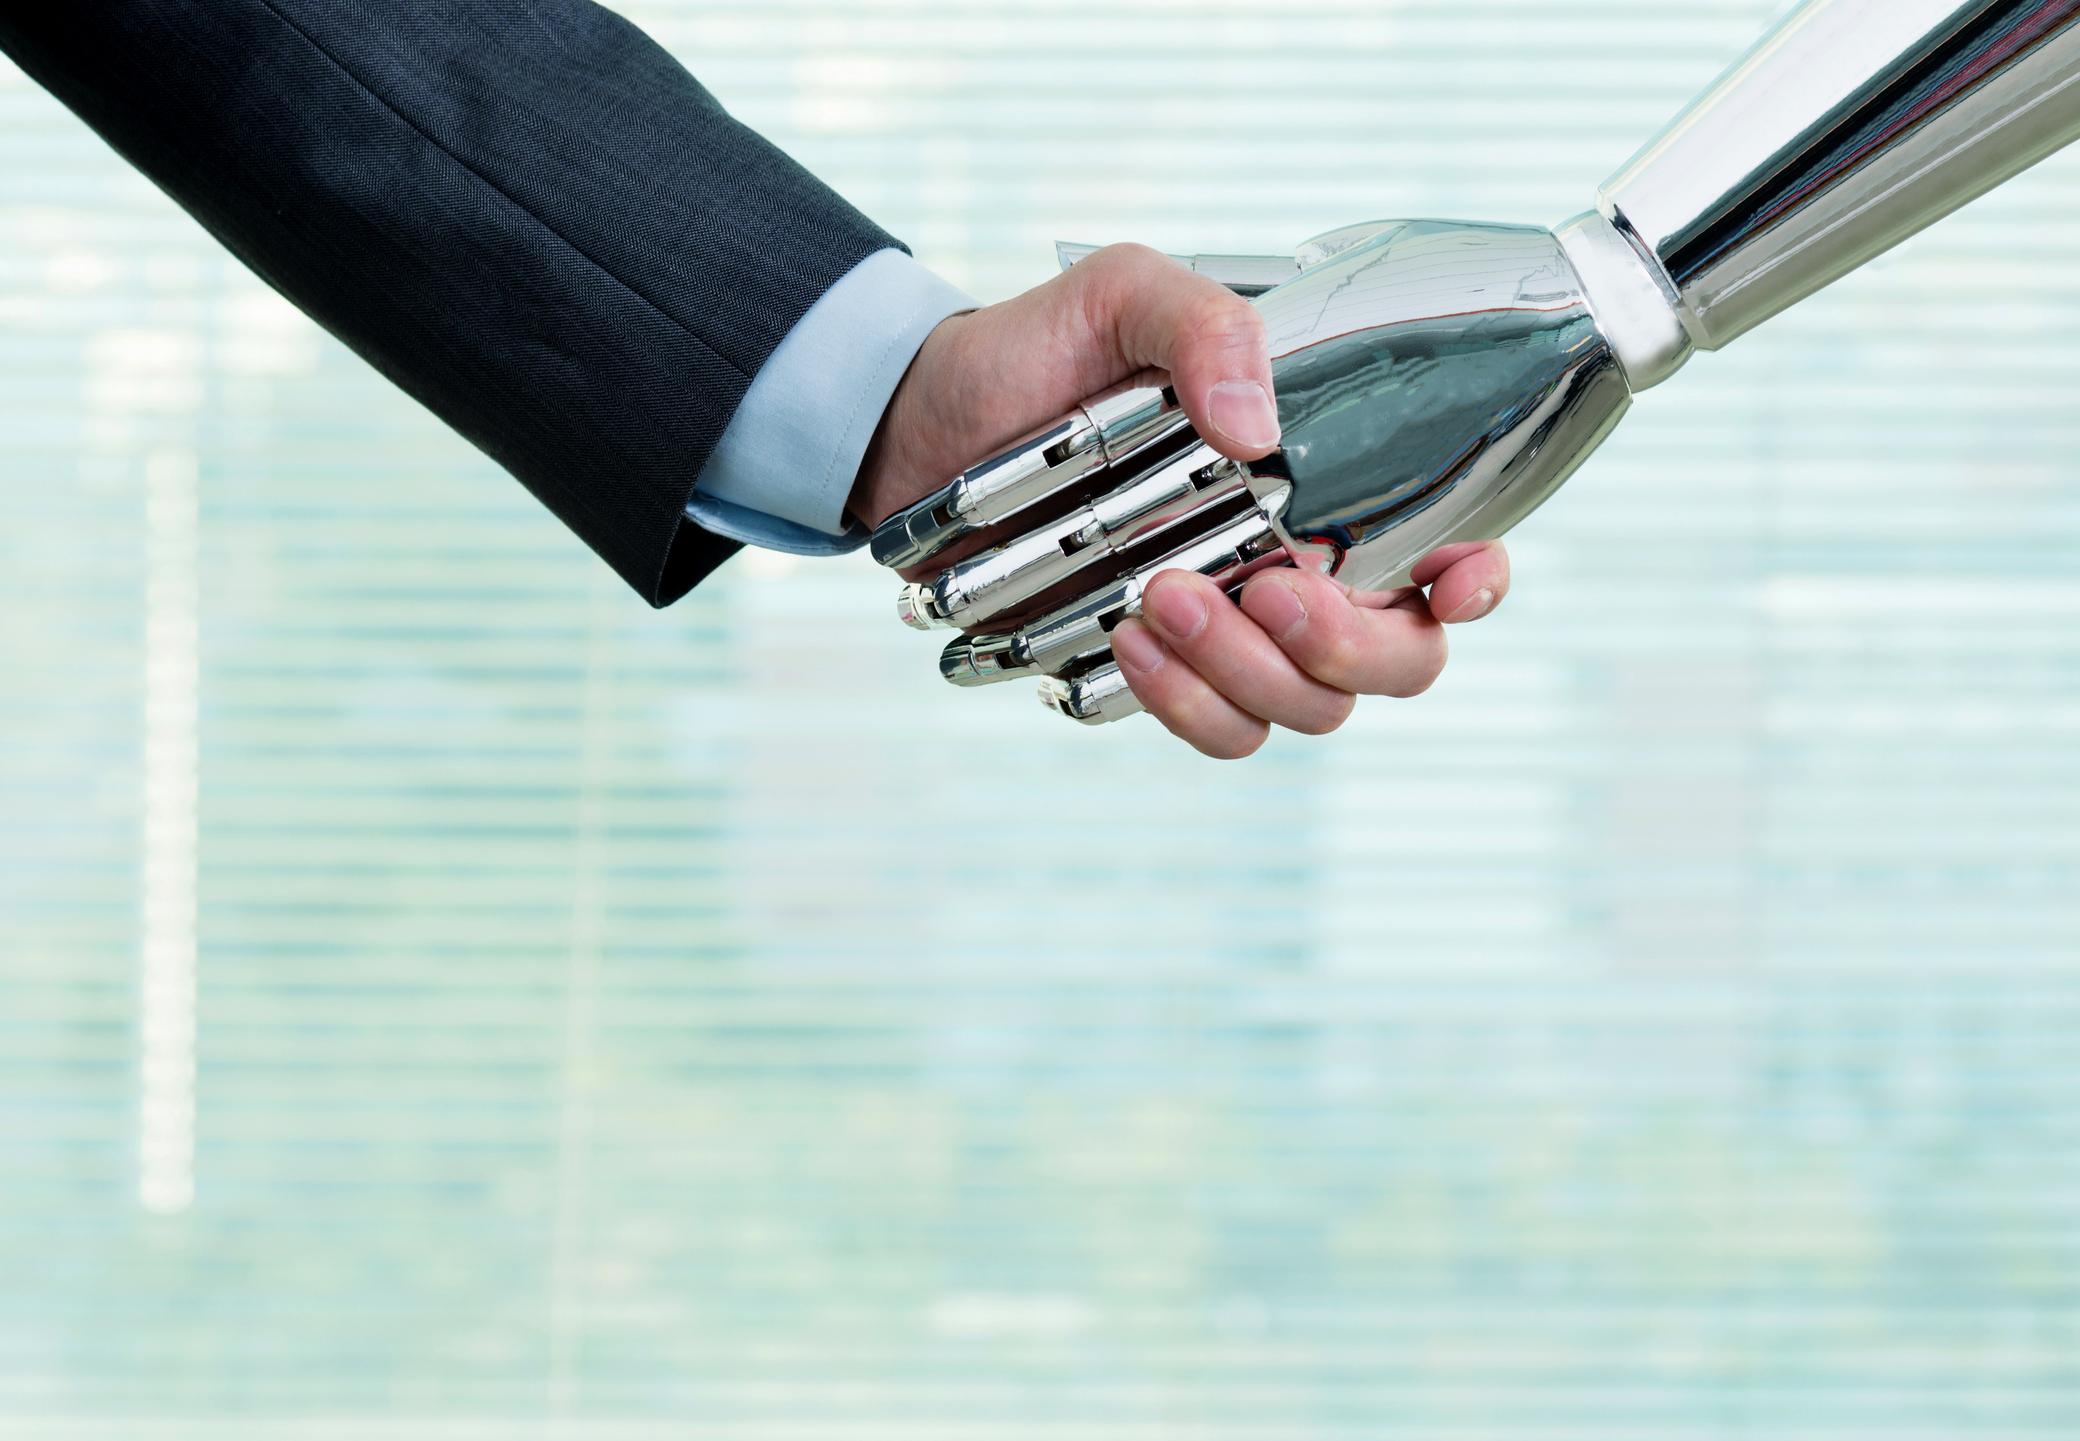 Entenda como funciona o Machine learning e como levá-lo para os negócios